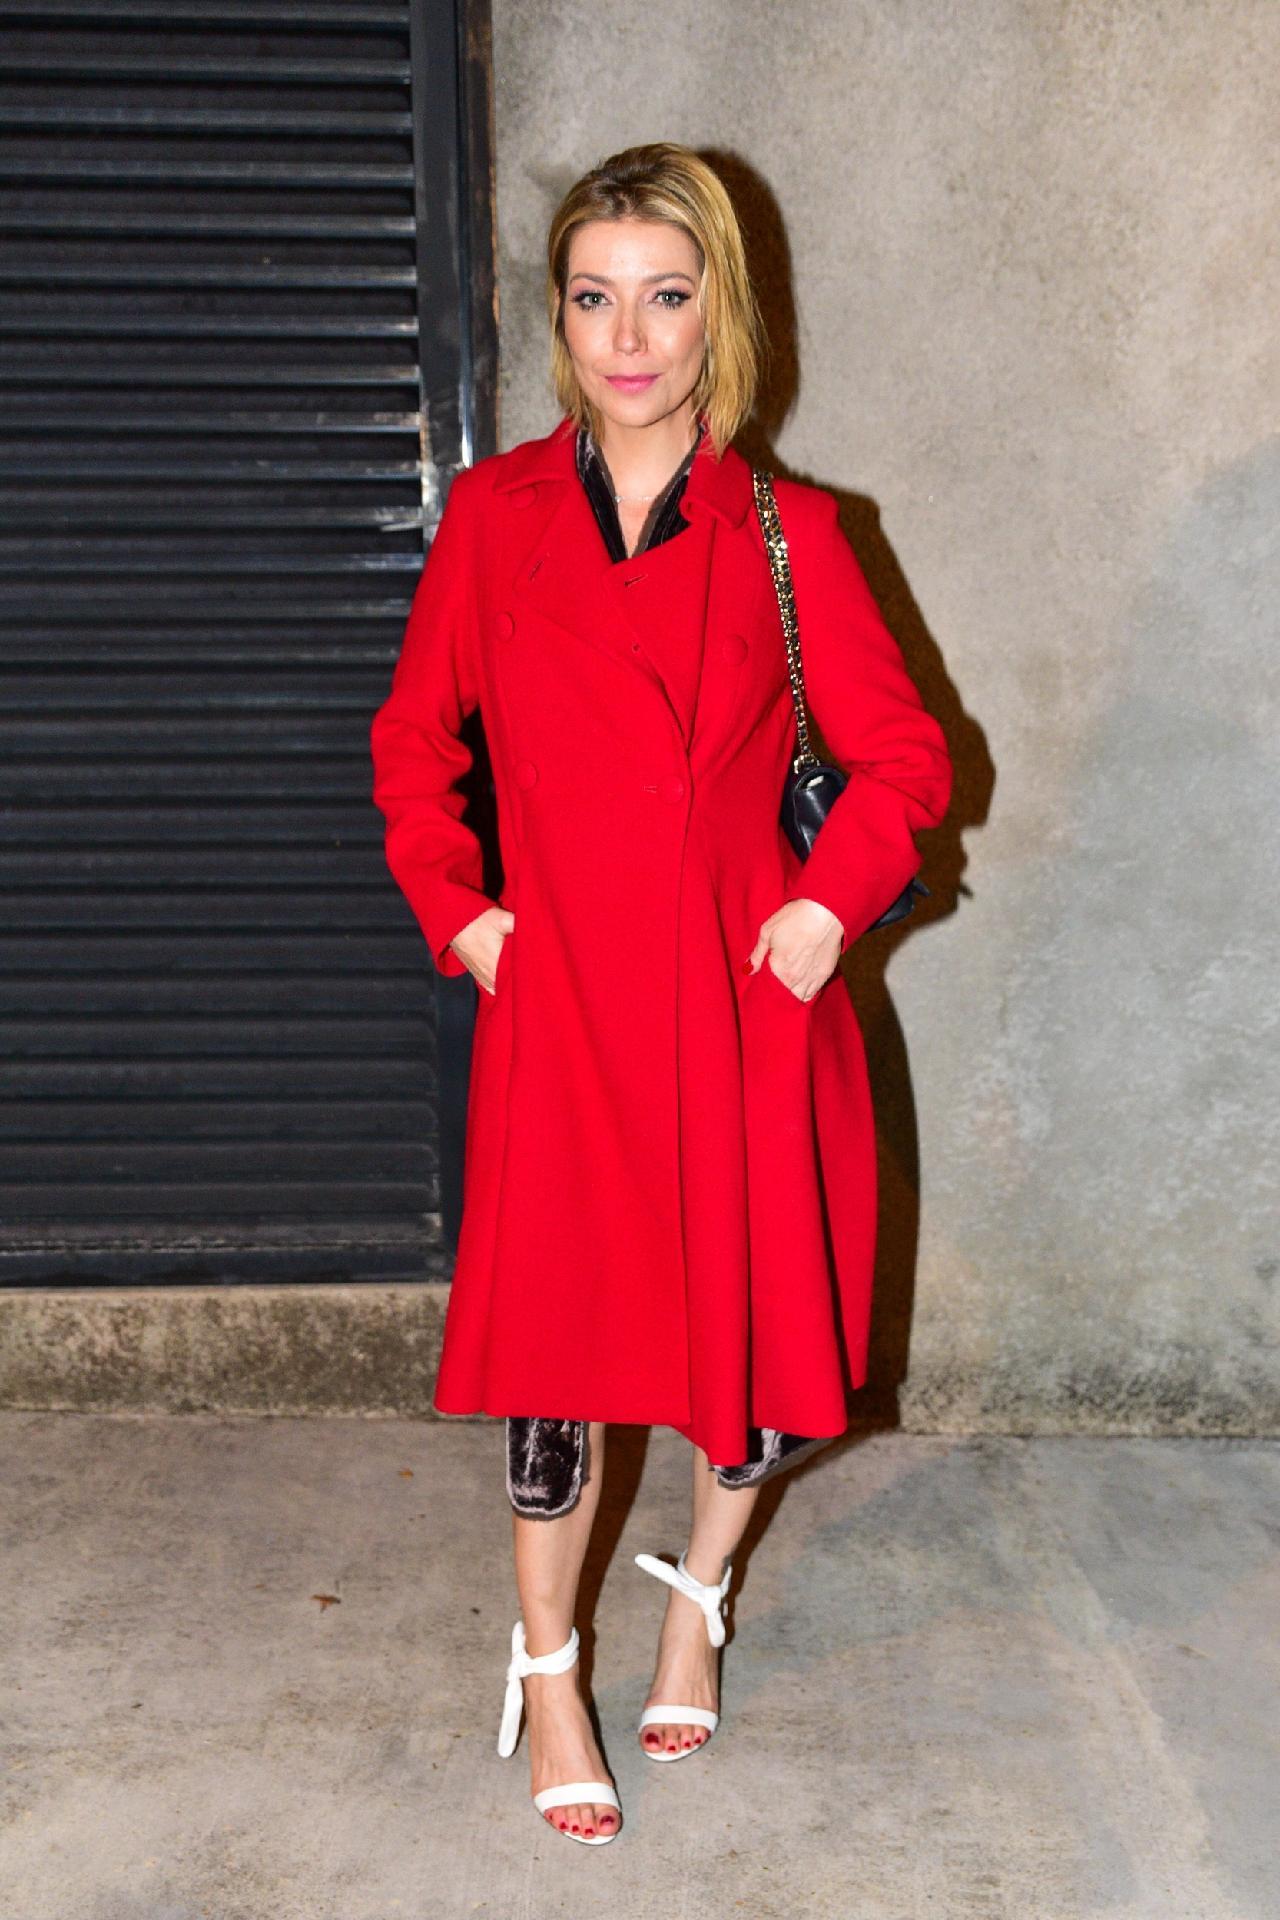 3d36870069 Luiza Possi aposta na tendência do casaco-vestido para look noturno  repita  - 19 07 2018 - UOL Universa